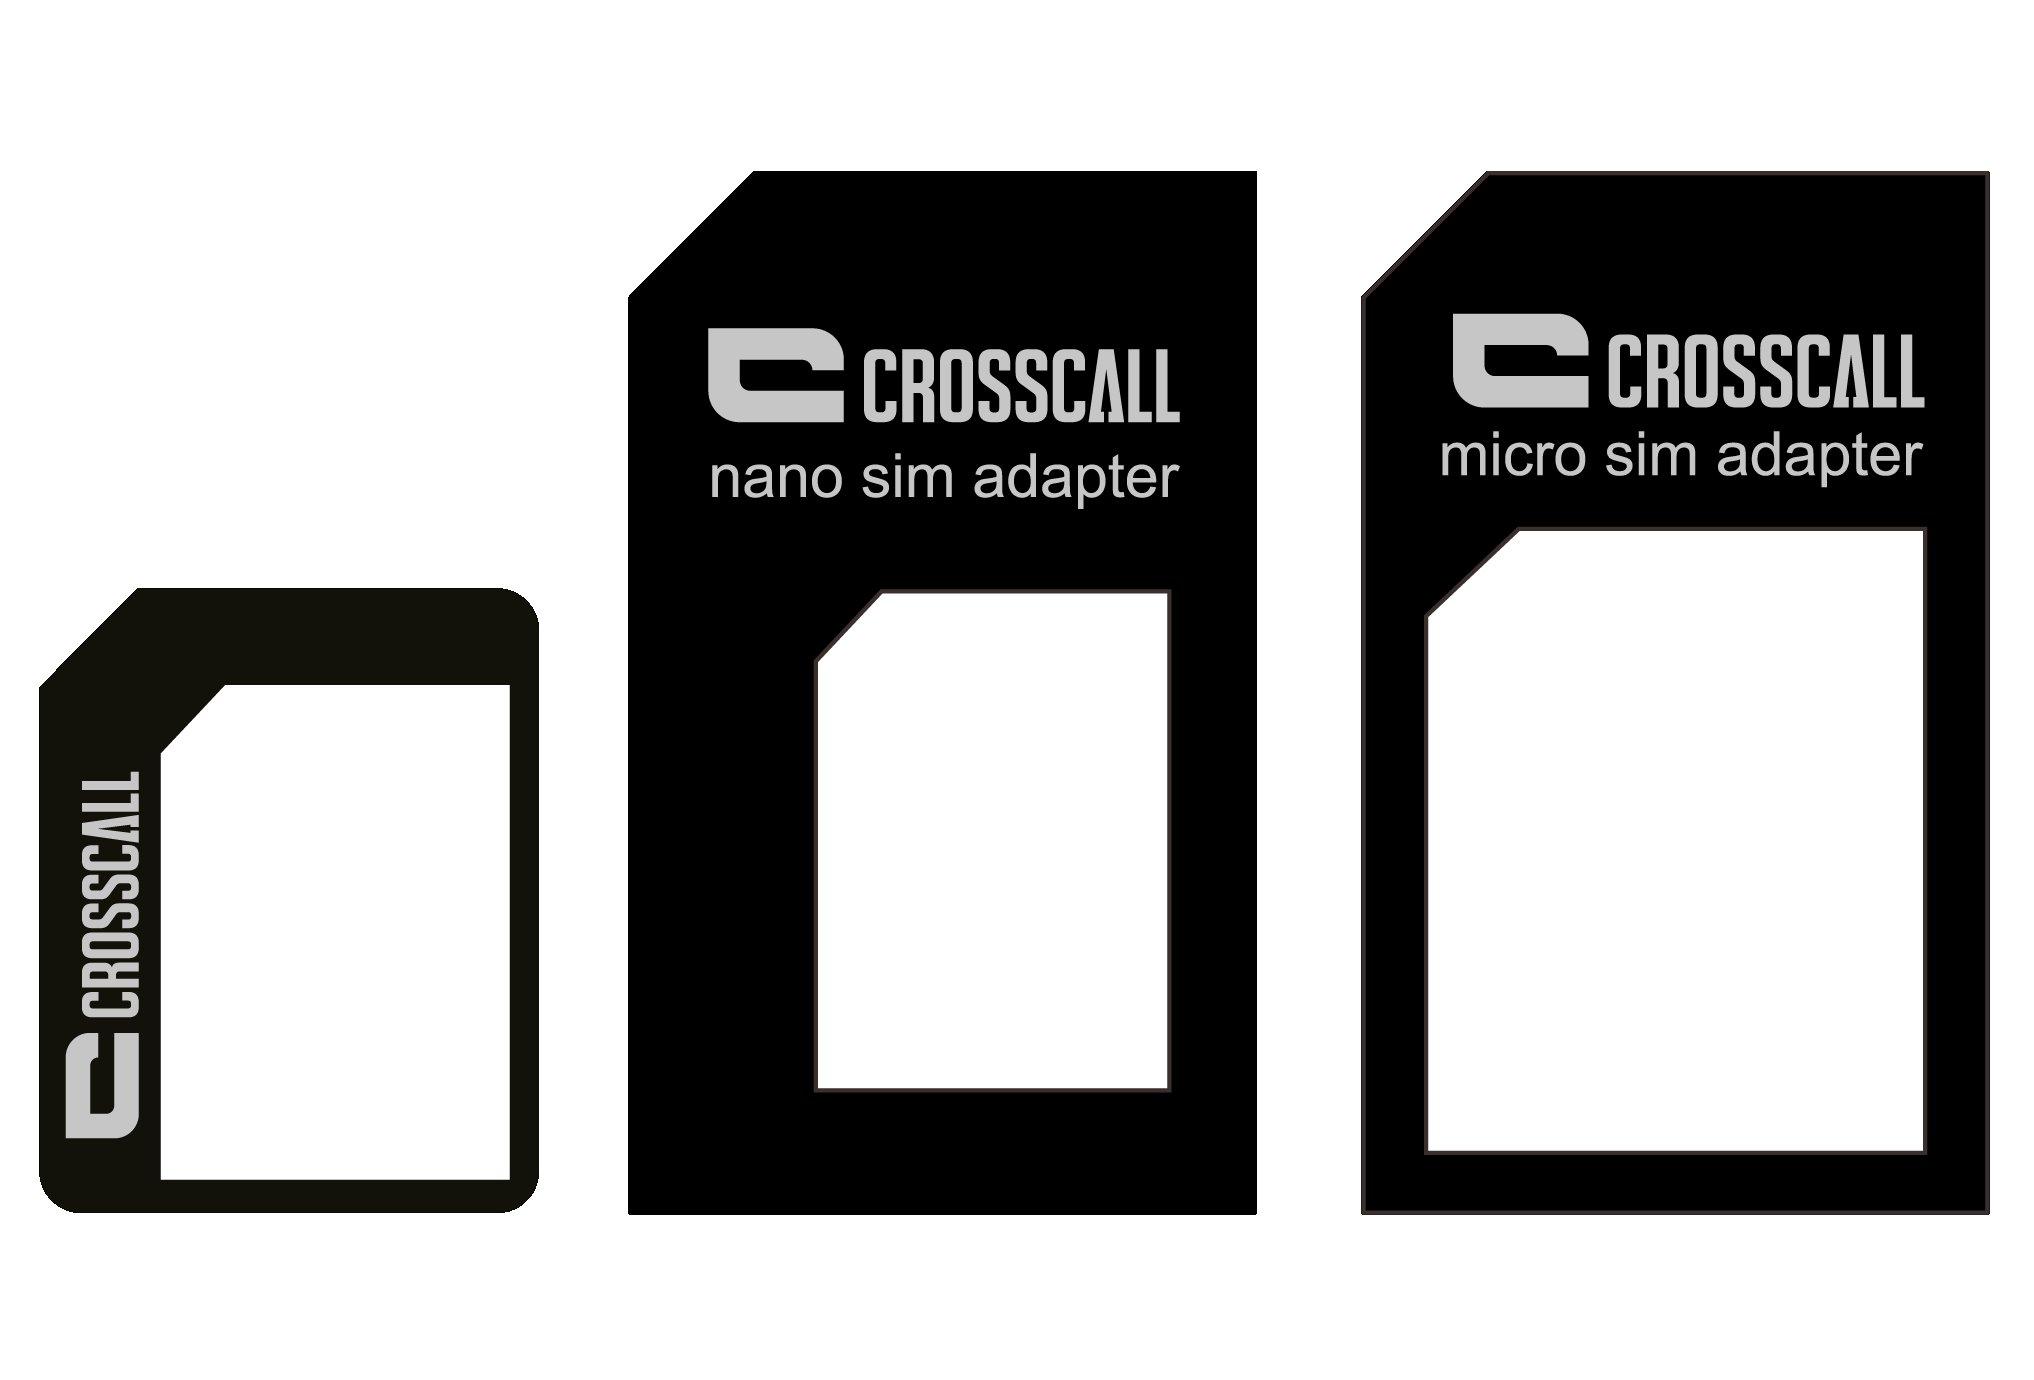 Crosscall Adaptateur carte SIM/Nano/Micro Accessoires téléphone